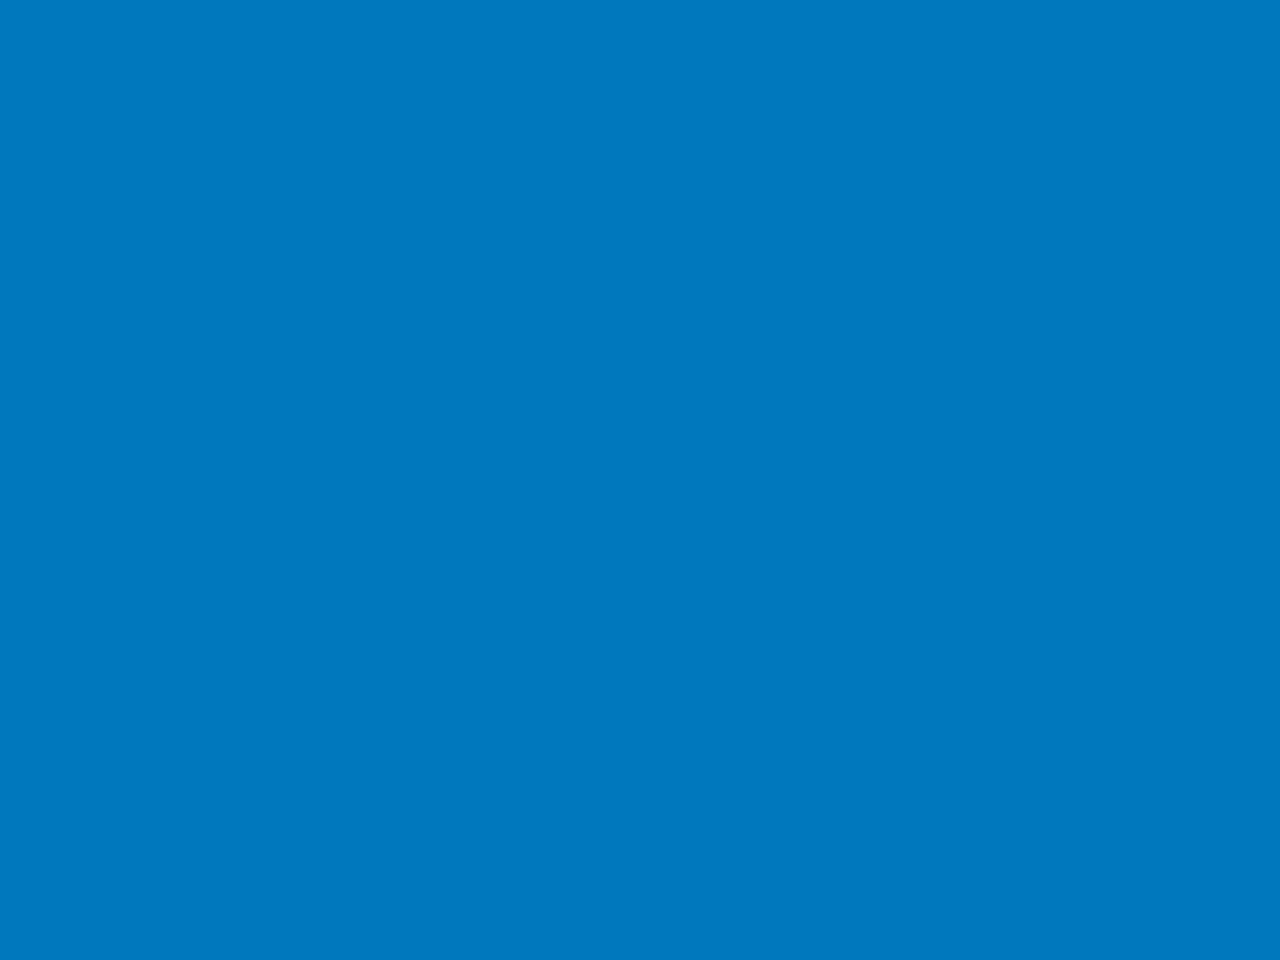 1280x960 Ocean Boat Blue Solid Color Background